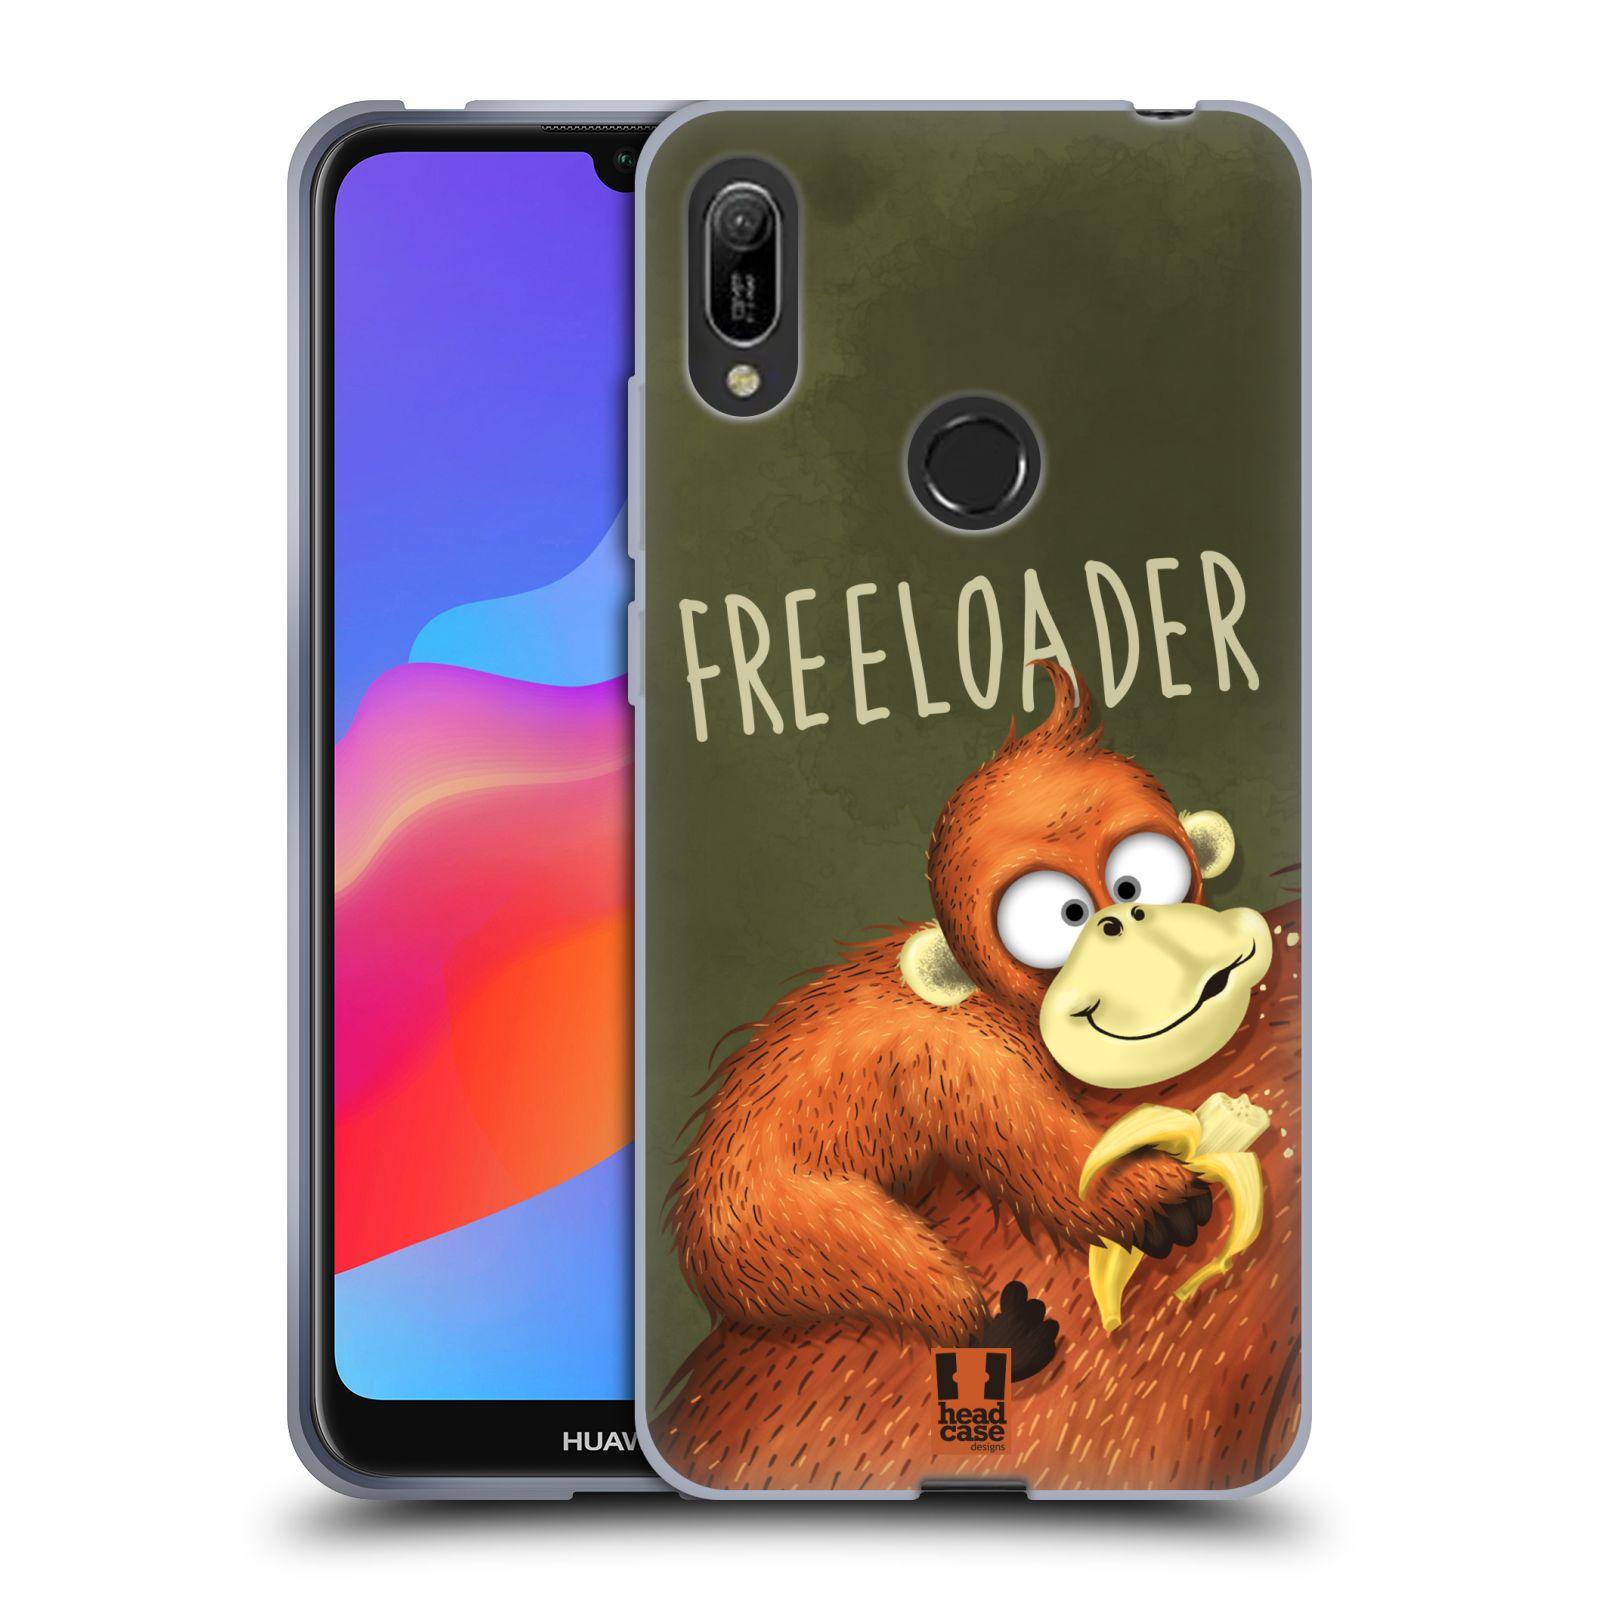 Silikonové pouzdro na mobil Huawei Y6 (2019) - Head Case - Opičák Freeloader